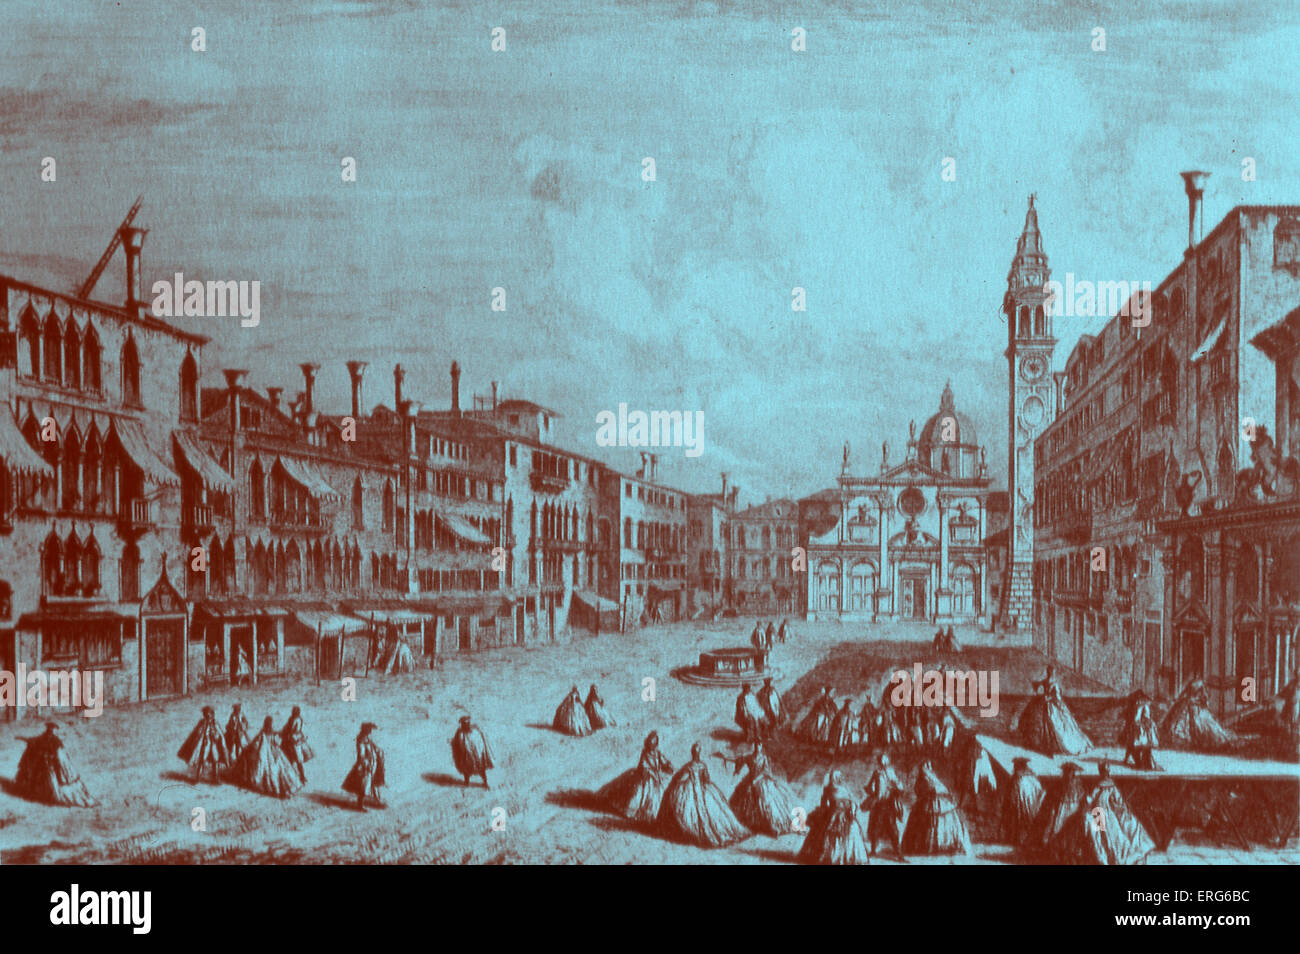 VENICE - PIAZZA SANTA MARIA FORMOSA. 18th century engraving showing people promenading in the square Time of Vivaldi, - Stock Image